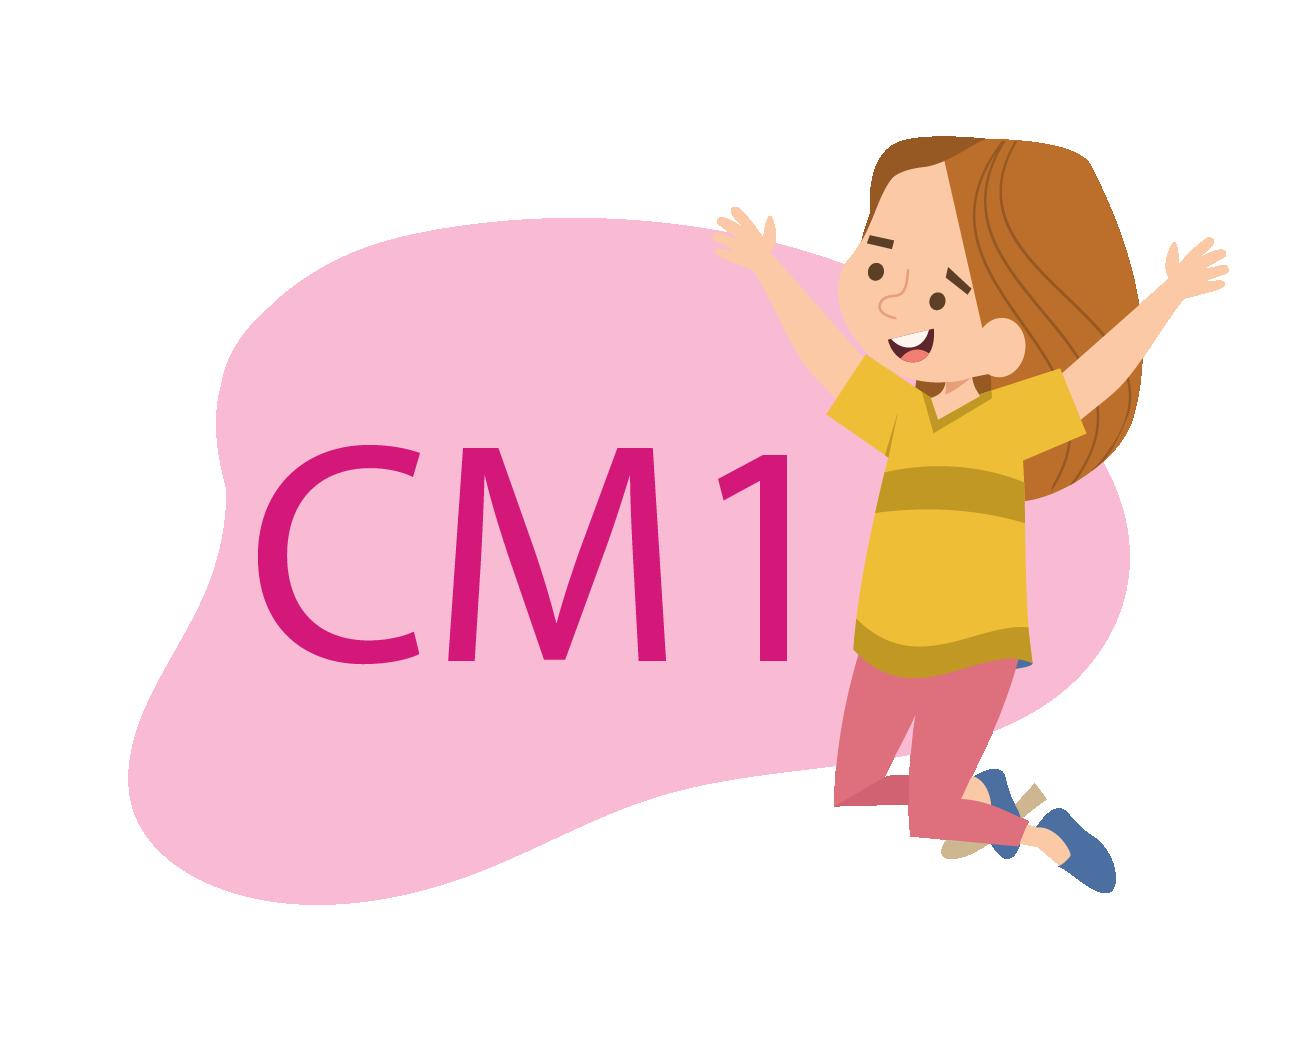 CM1 Mme Perles